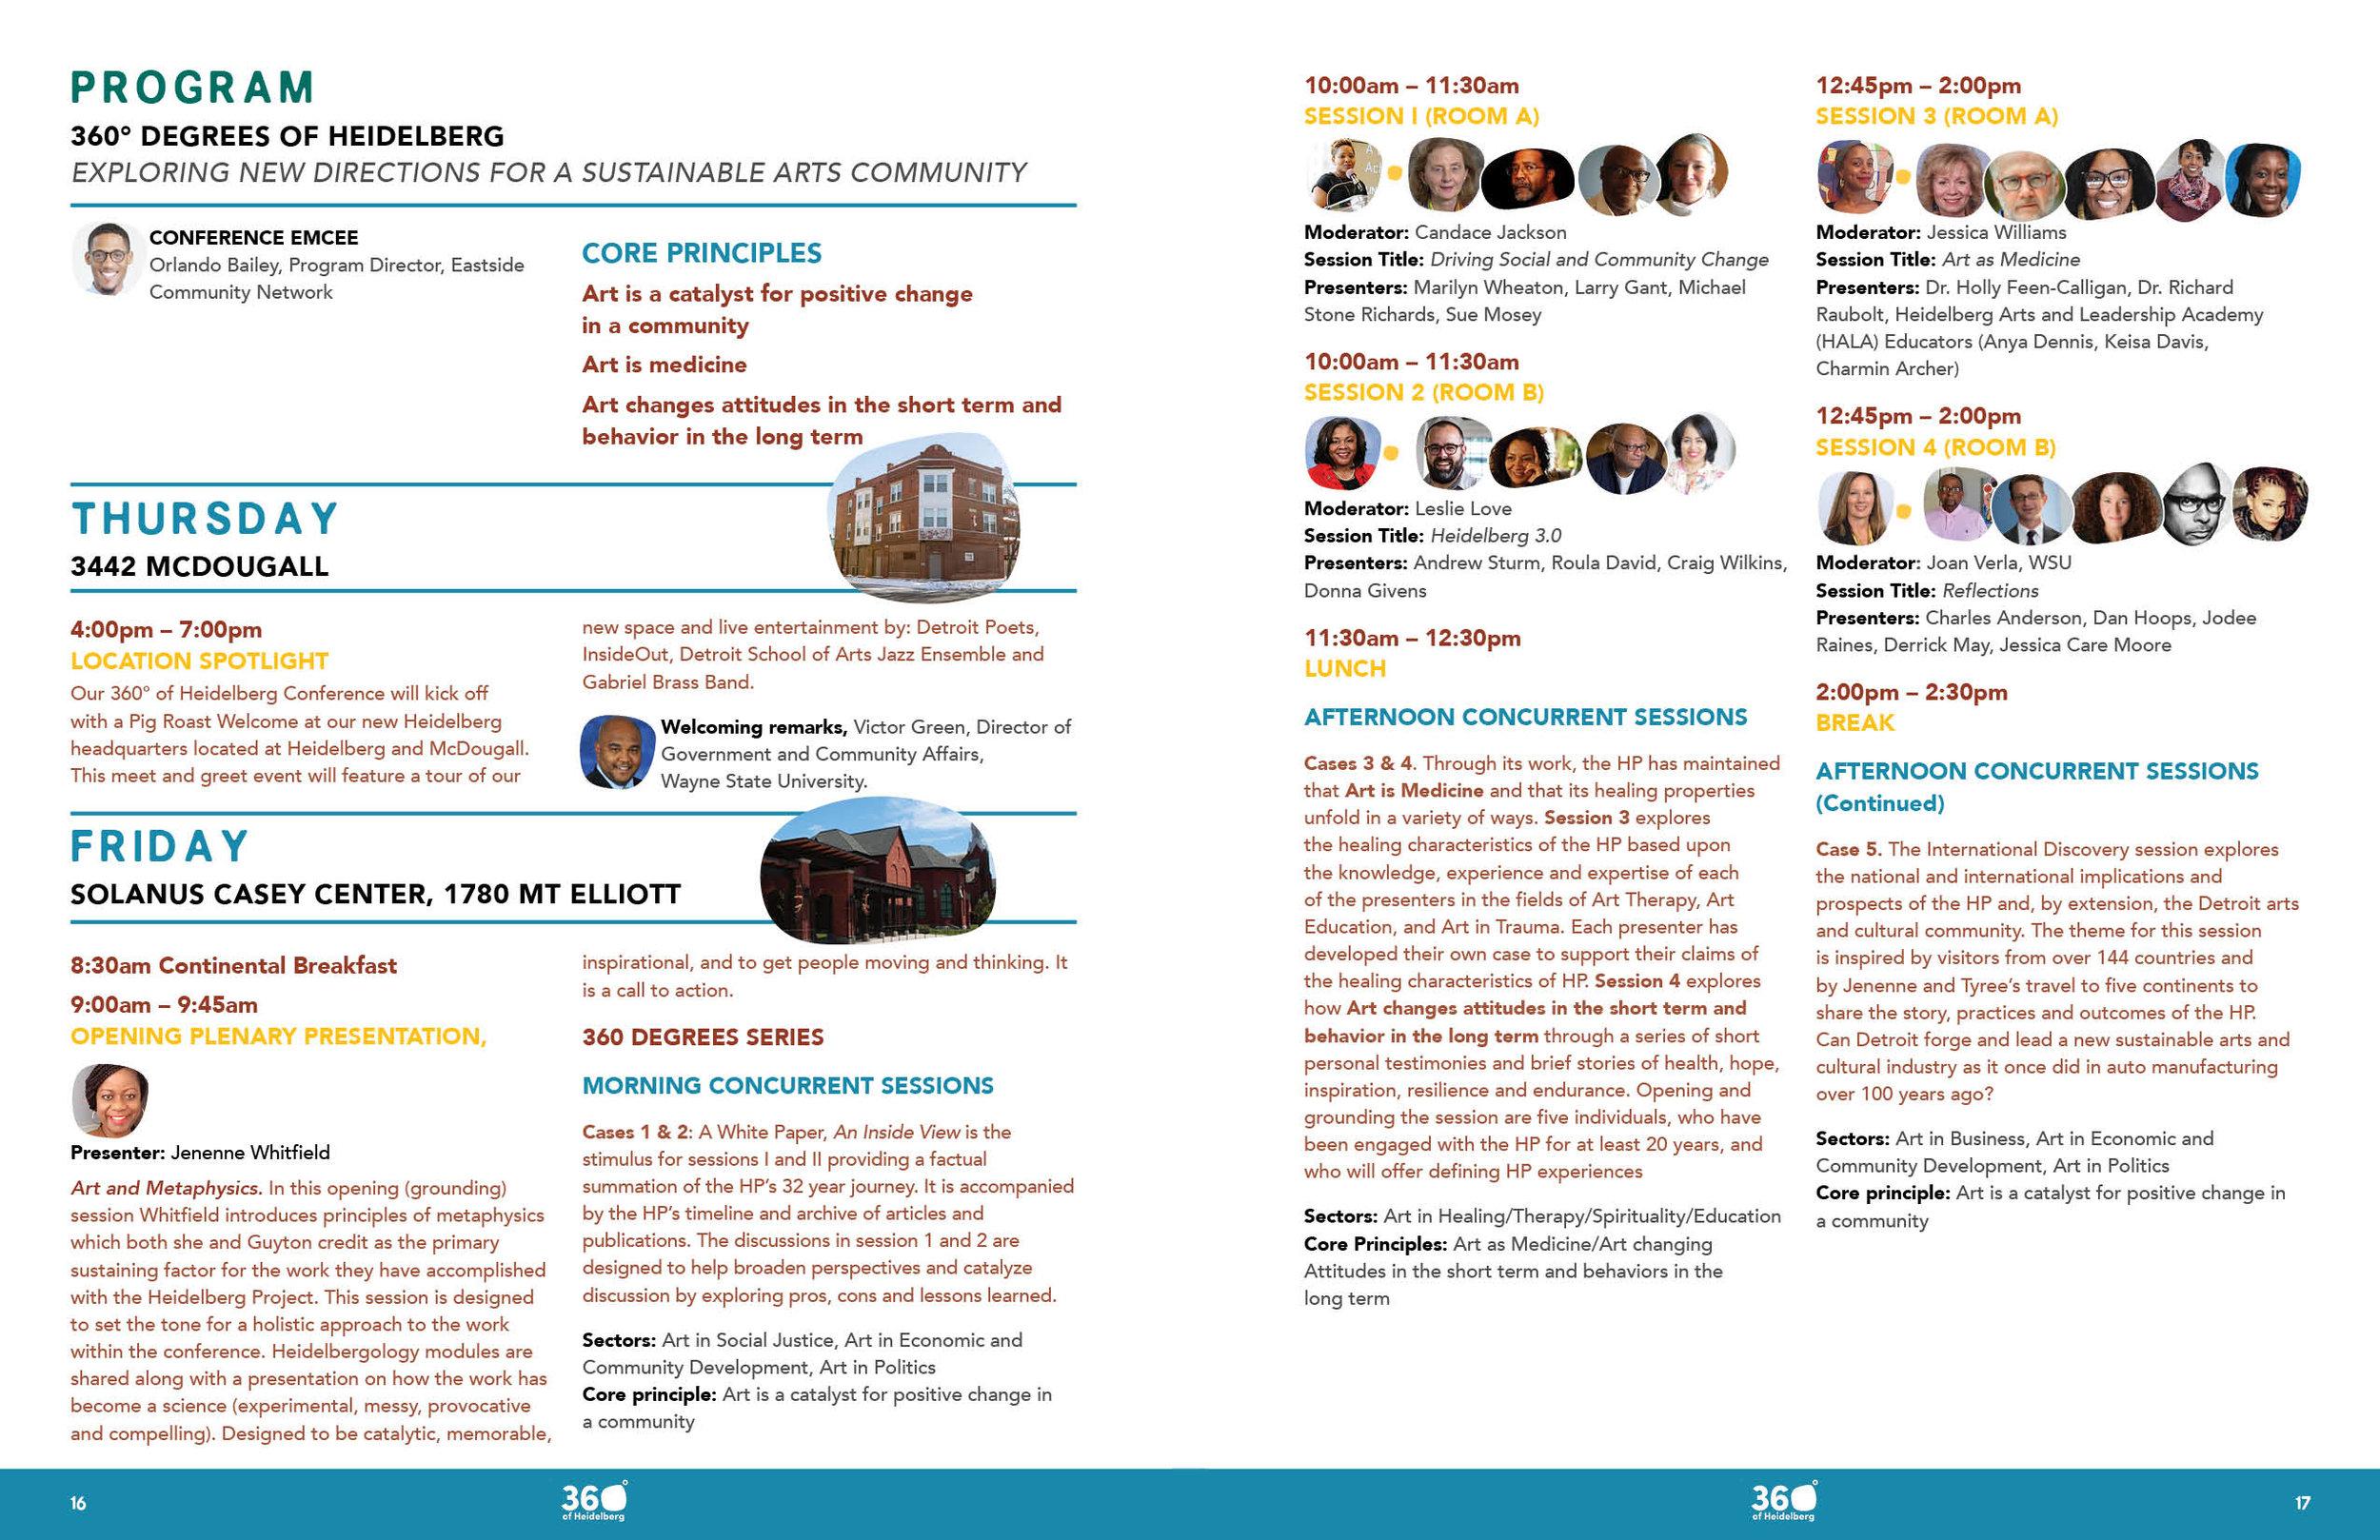 HeidelbergProject_ProgramBook2018_007.jpg